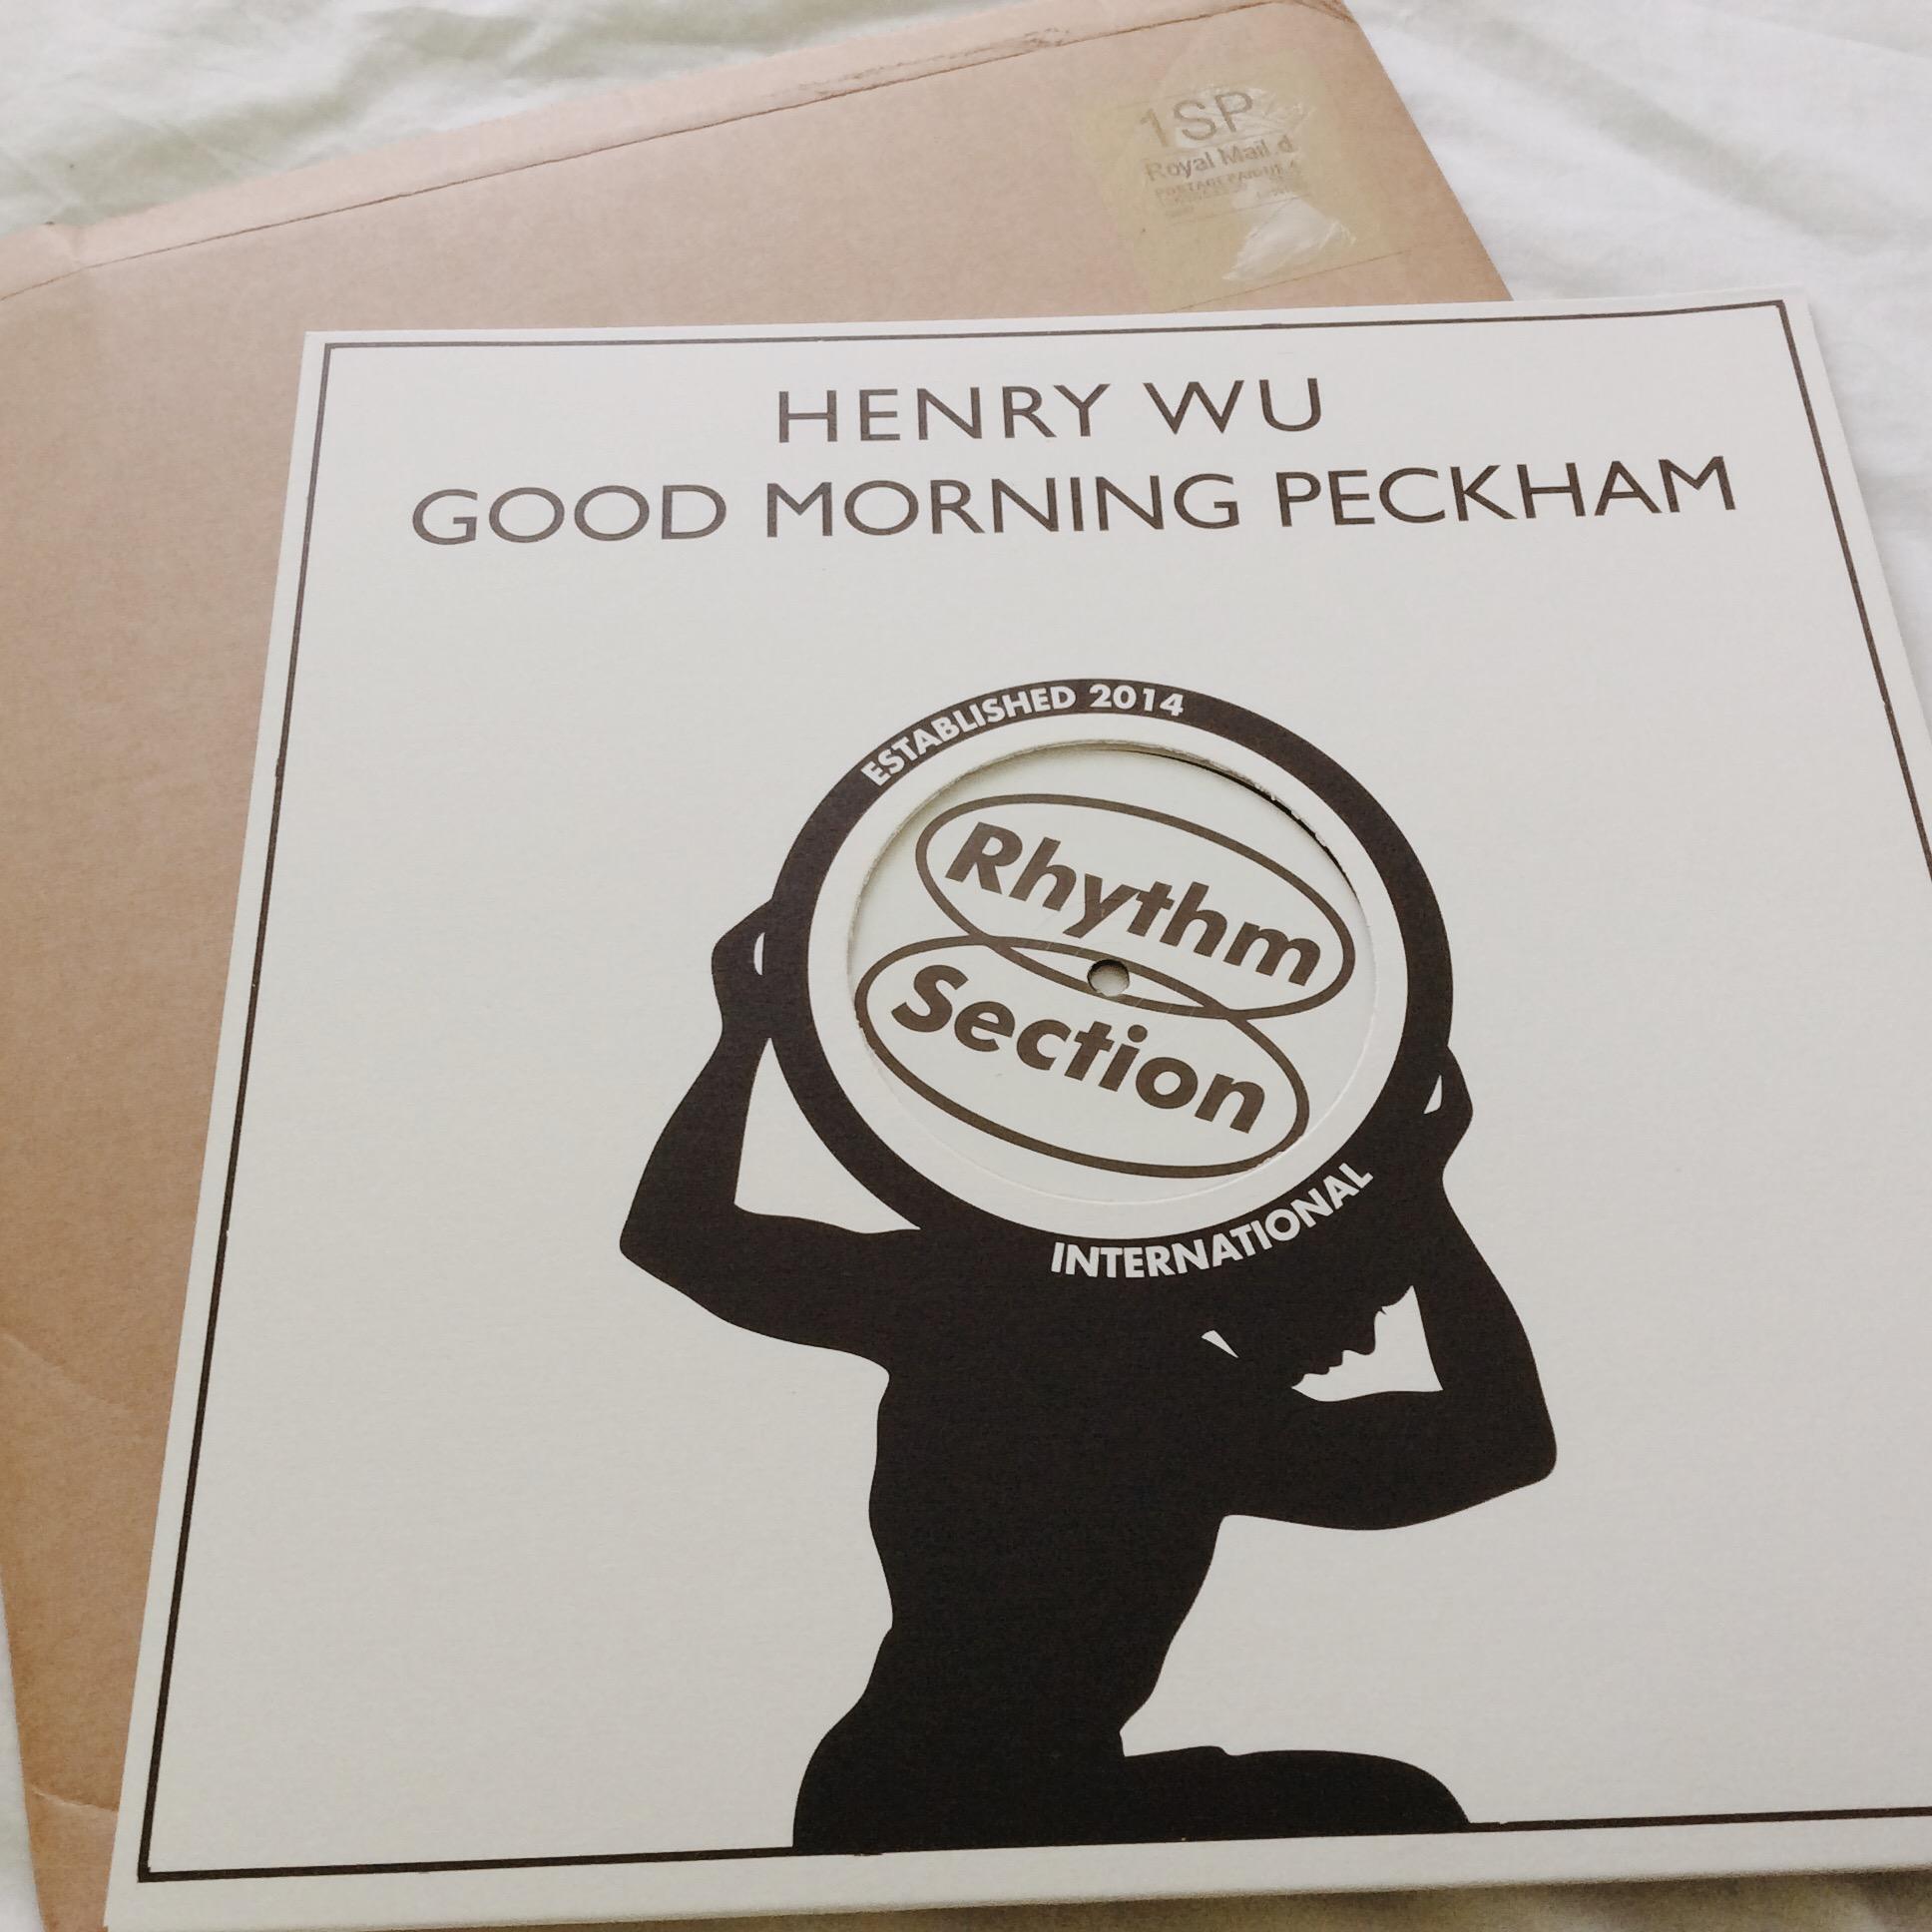 Henry Wu/Rhythm Section International